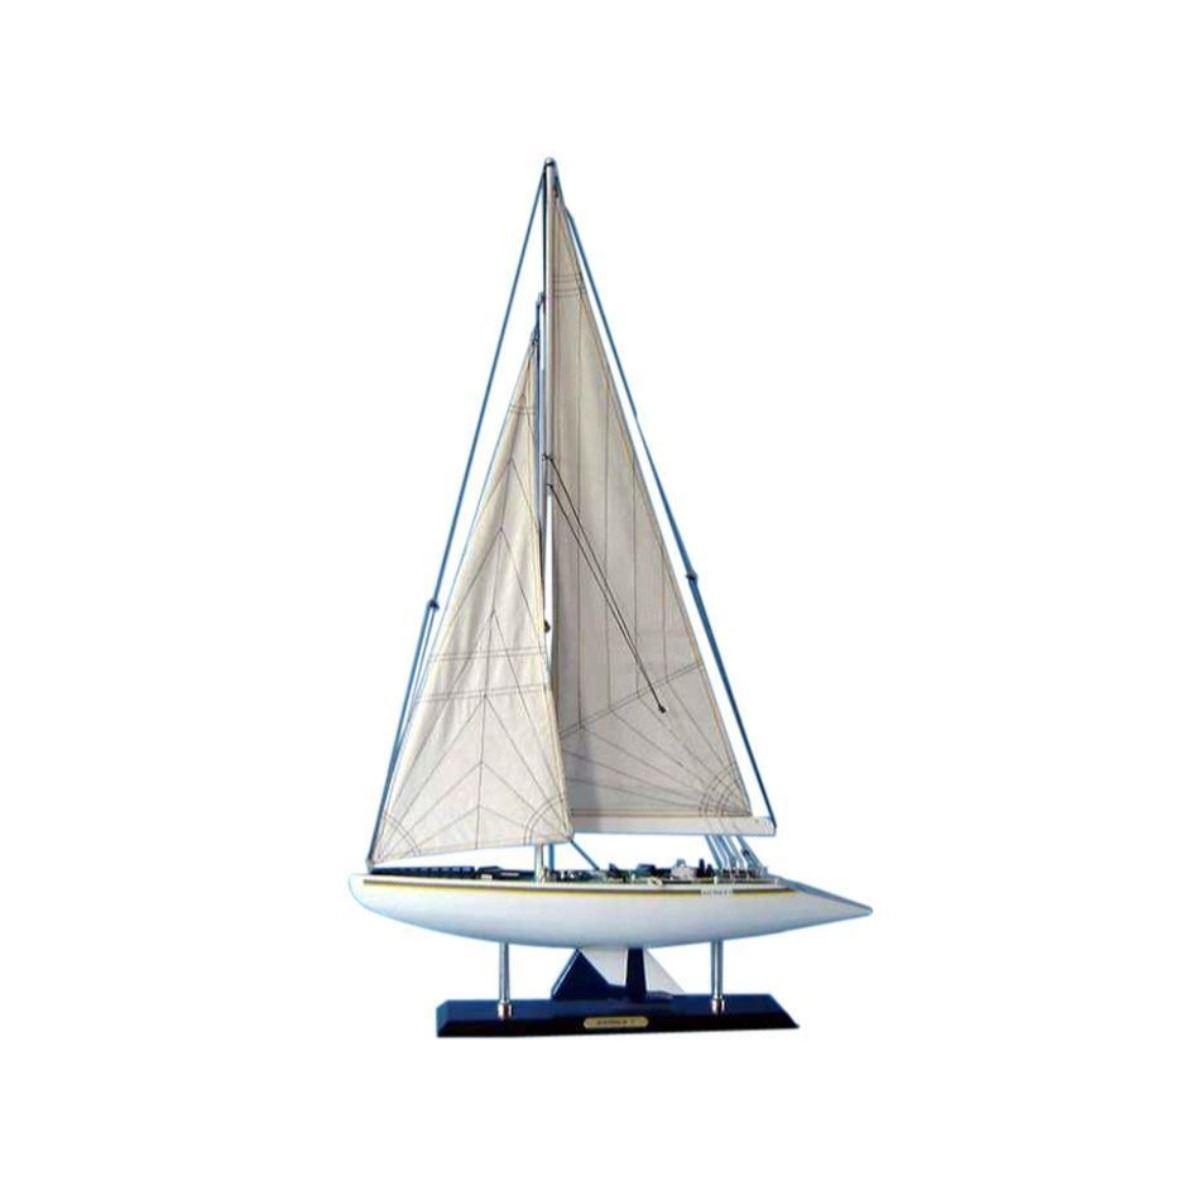 Wooden Australia 2 Limited Model Yacht 40